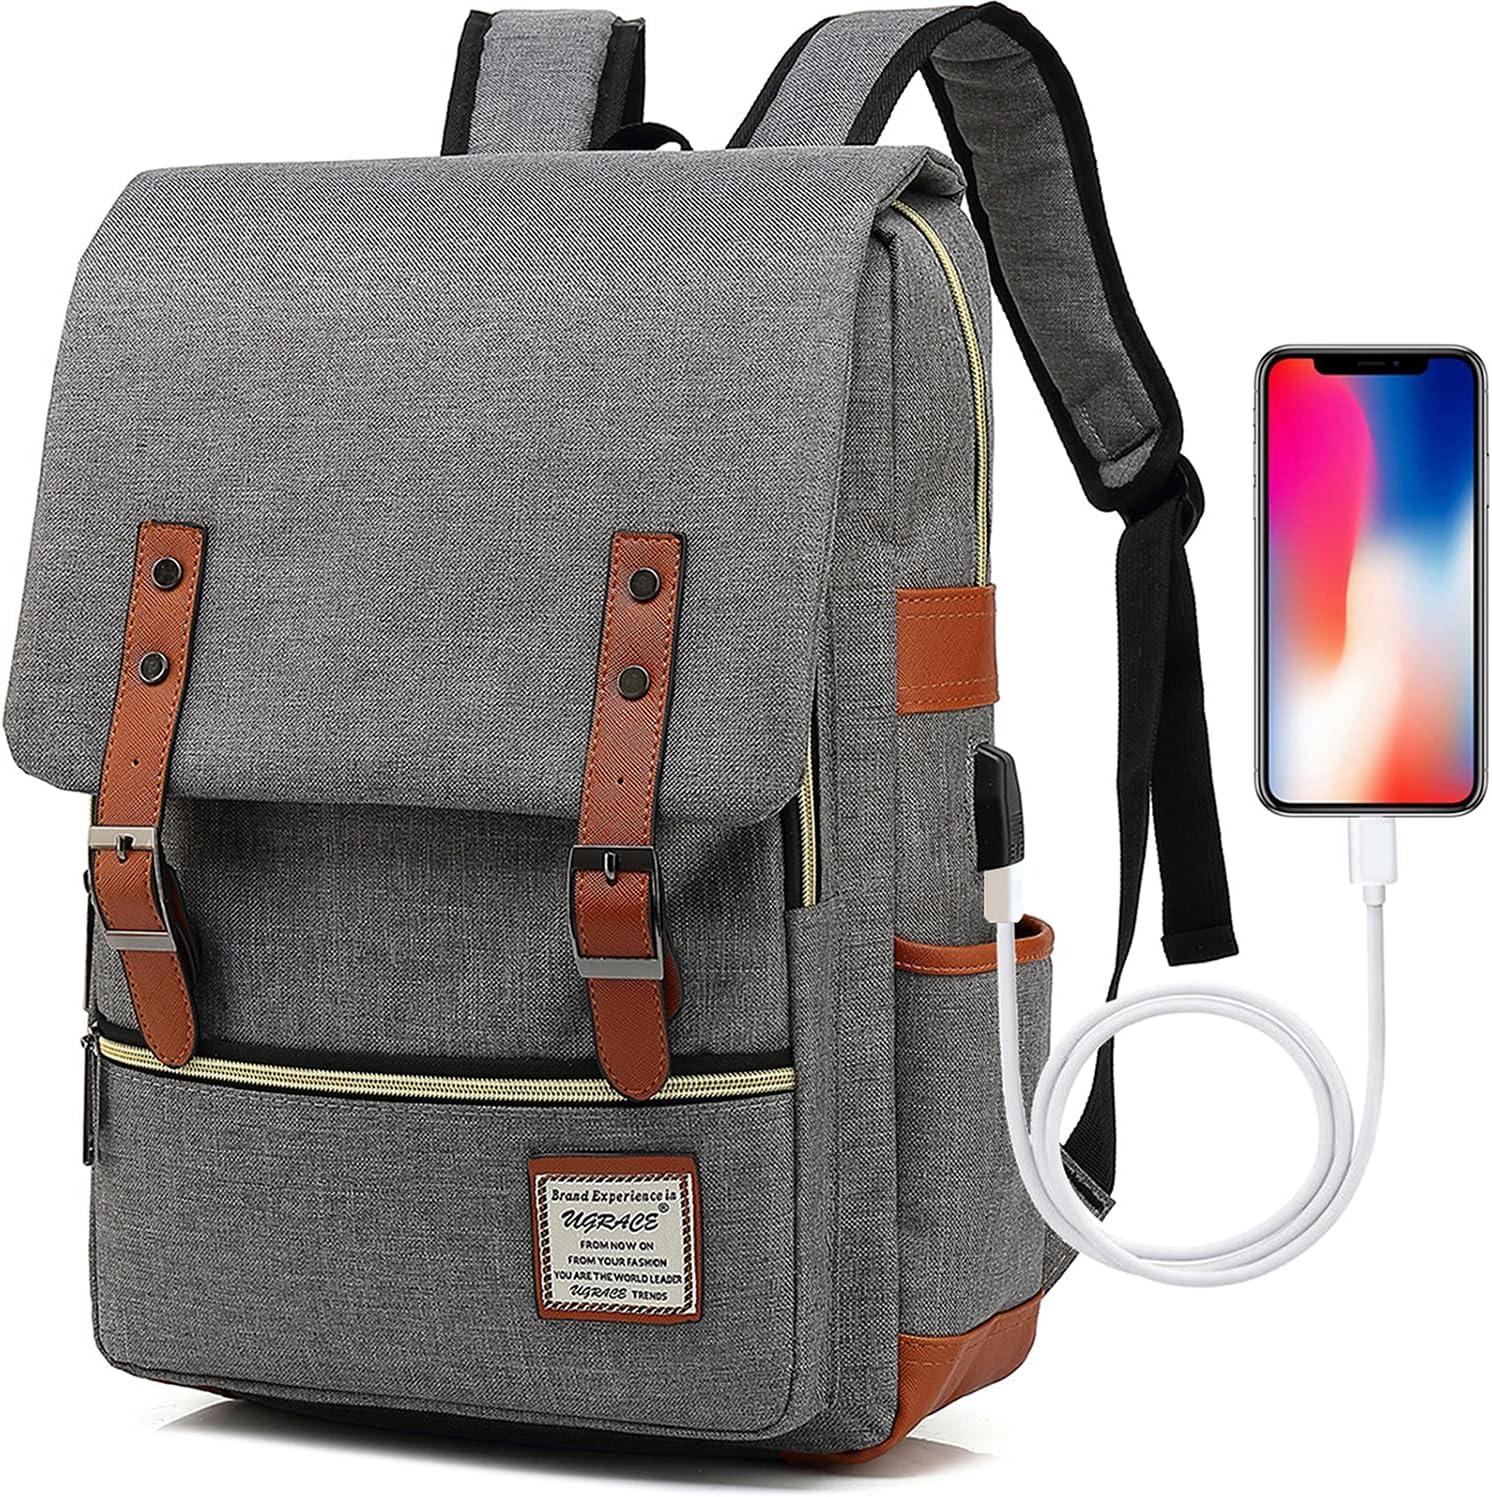 UGRACE Vintage Laptop Backpack with USB Charging Port, Elegant Water Resistant Travelling Backpack Casual Daypacks School Shoulder Bag for Men Women, Fits up to 15.6Inch Laptop in Grey